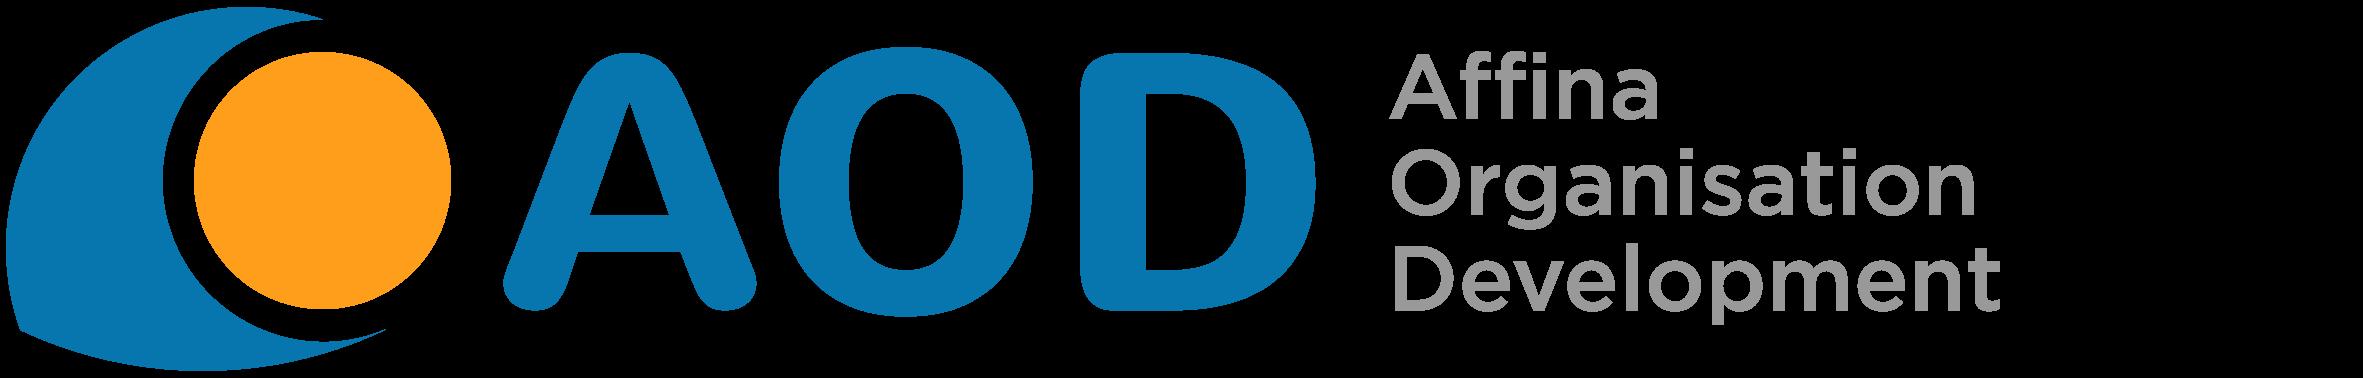 Affina Organisational Development logo